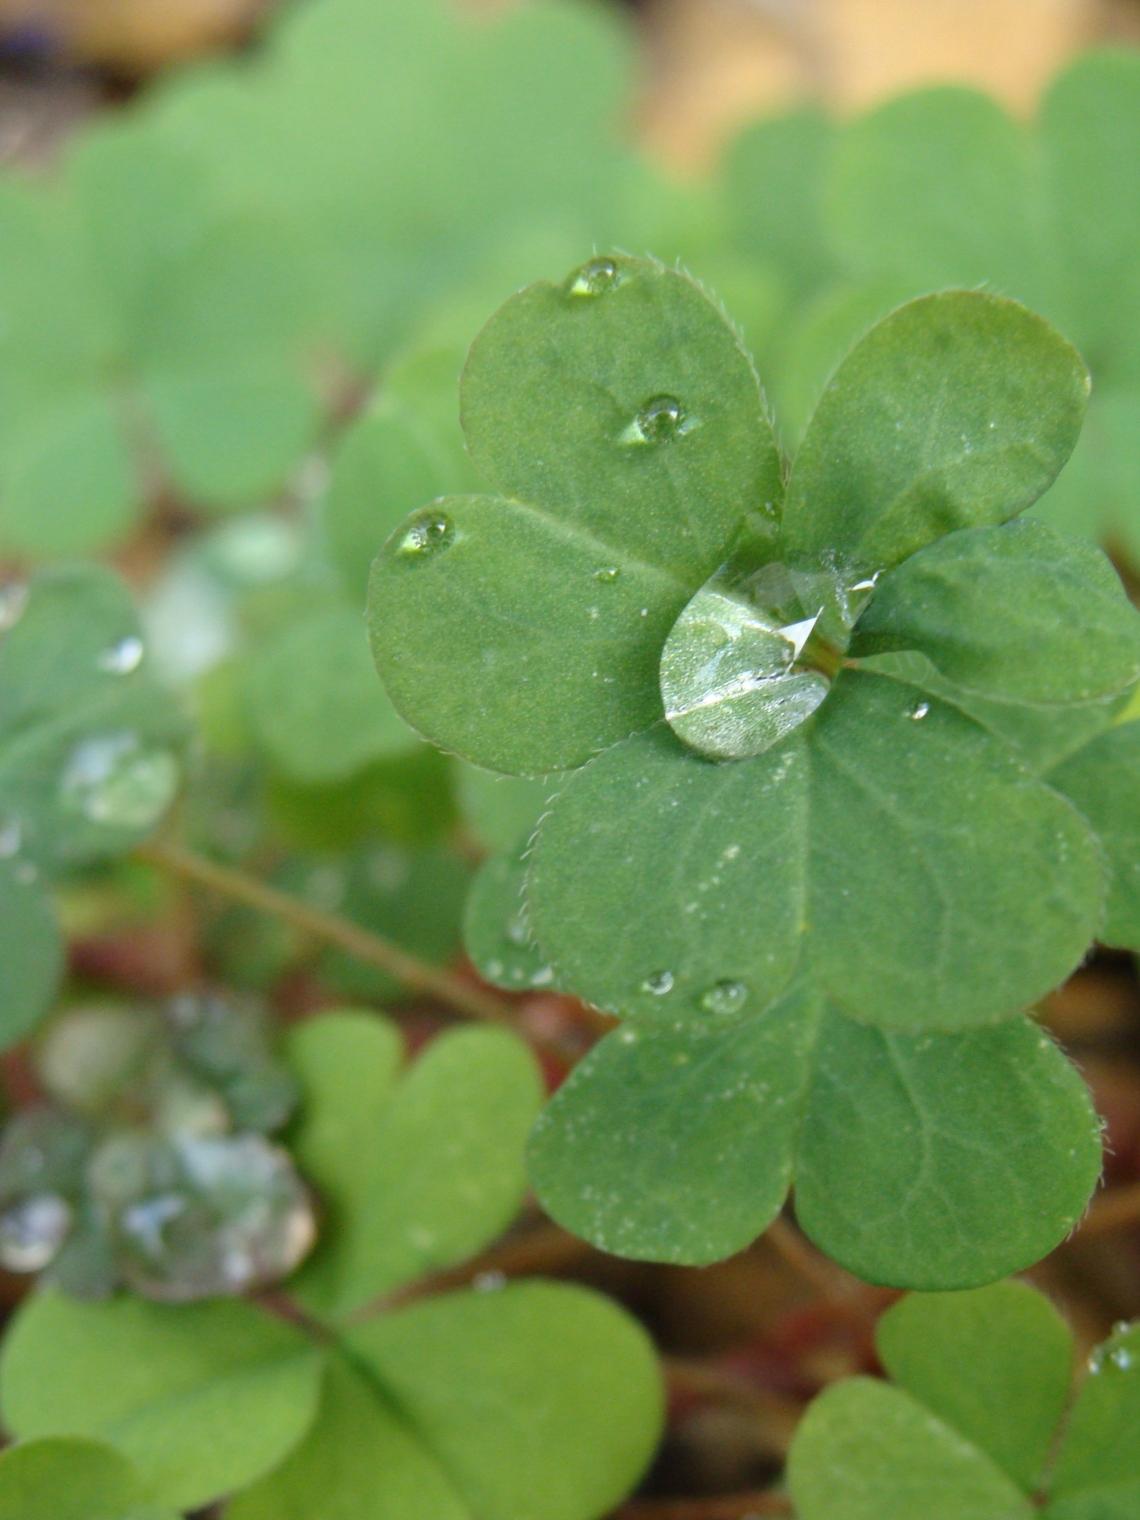 Clover Droplets